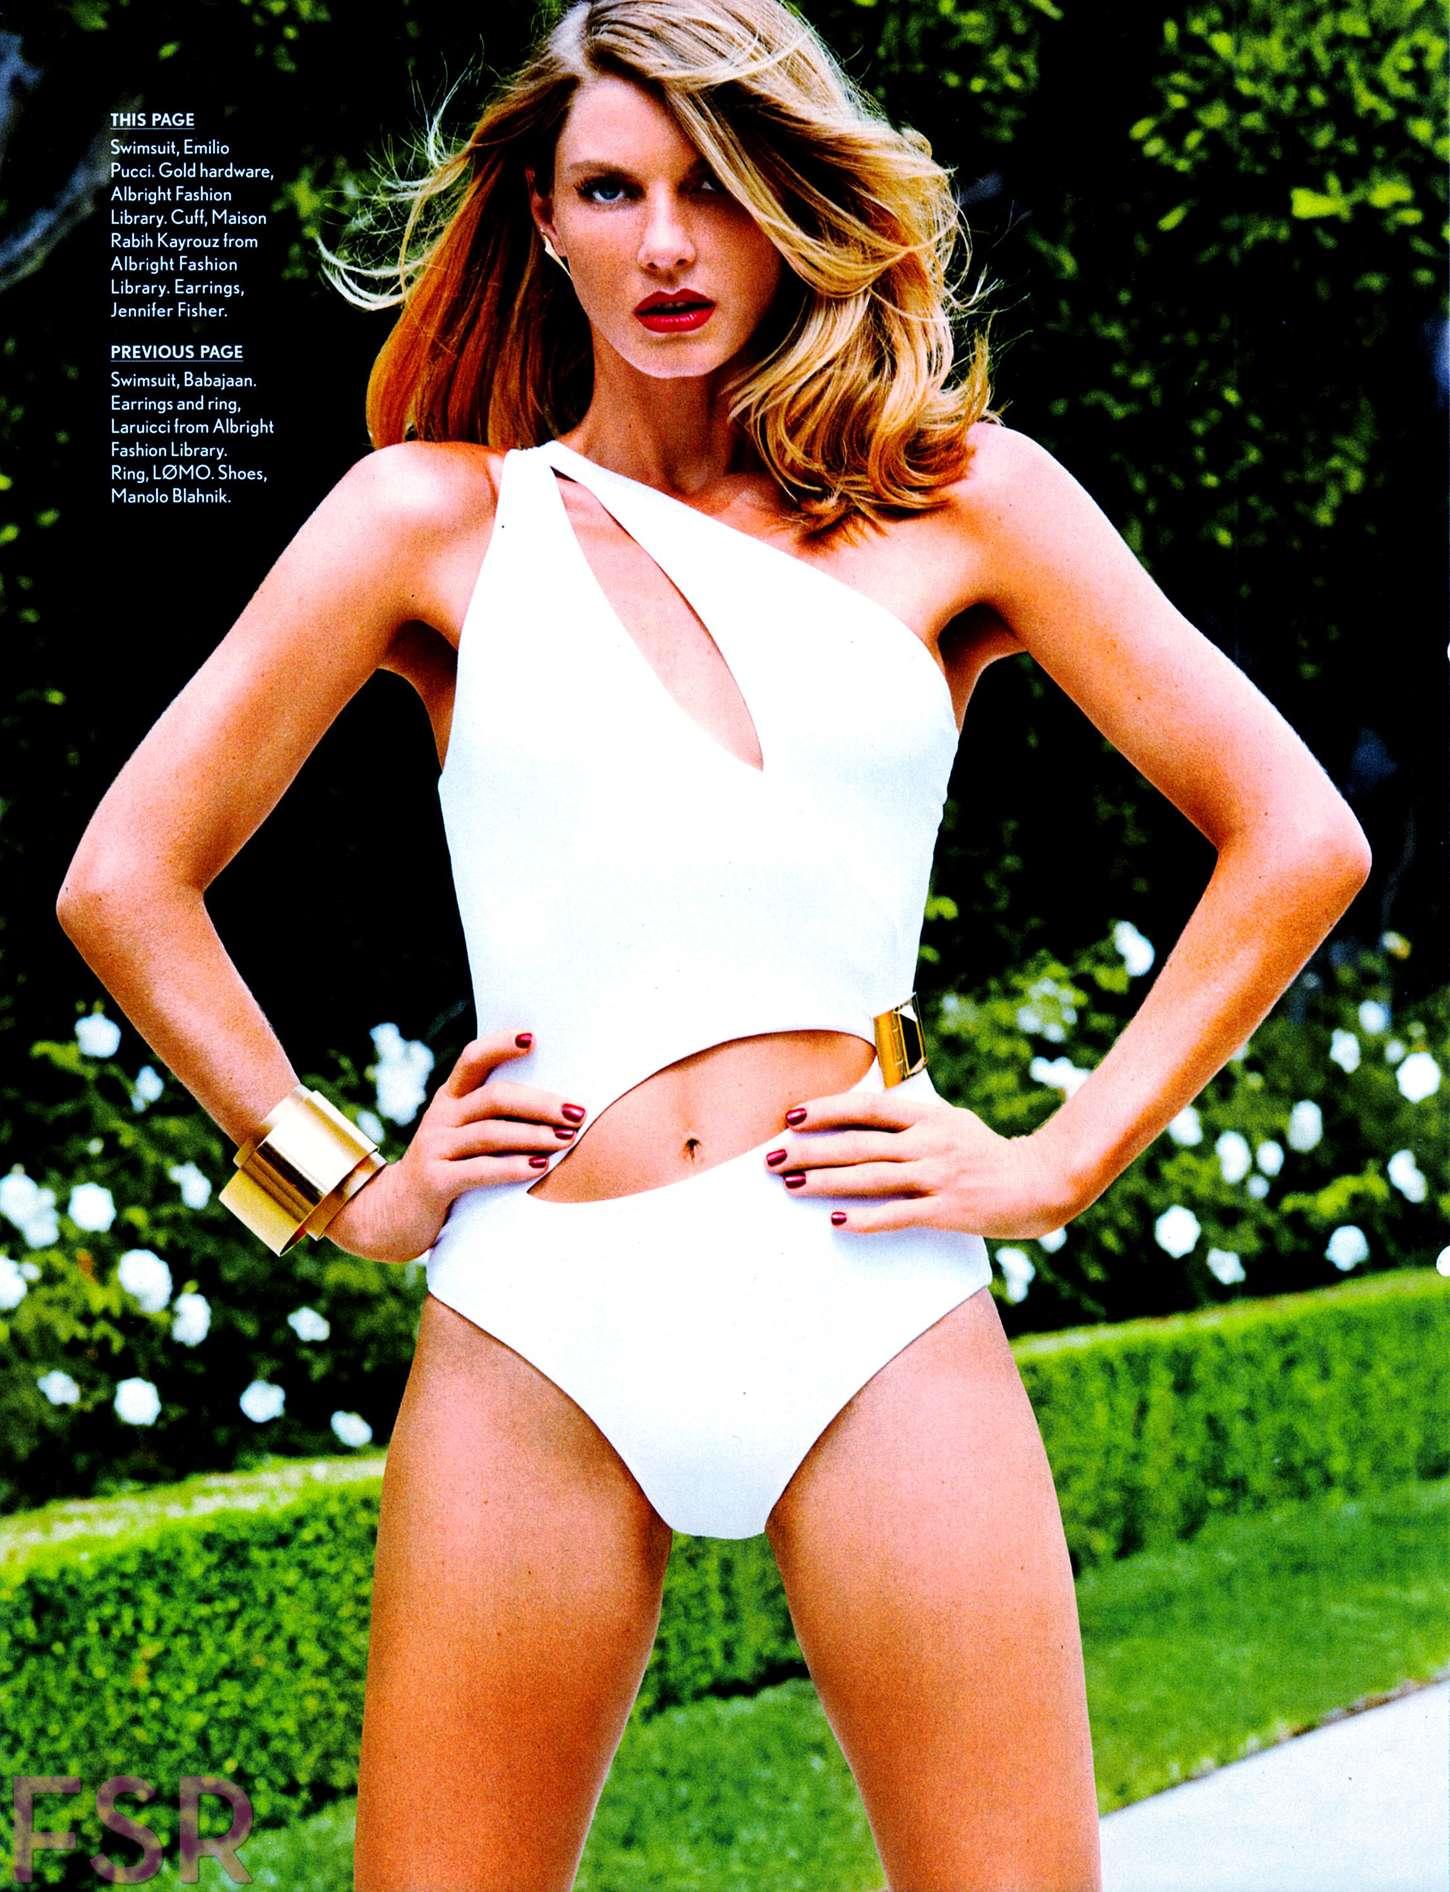 Angela lindvall maxim magazine oct 2014 by james macari hq photo shoot nude (58 photo), Feet Celebrites fotos